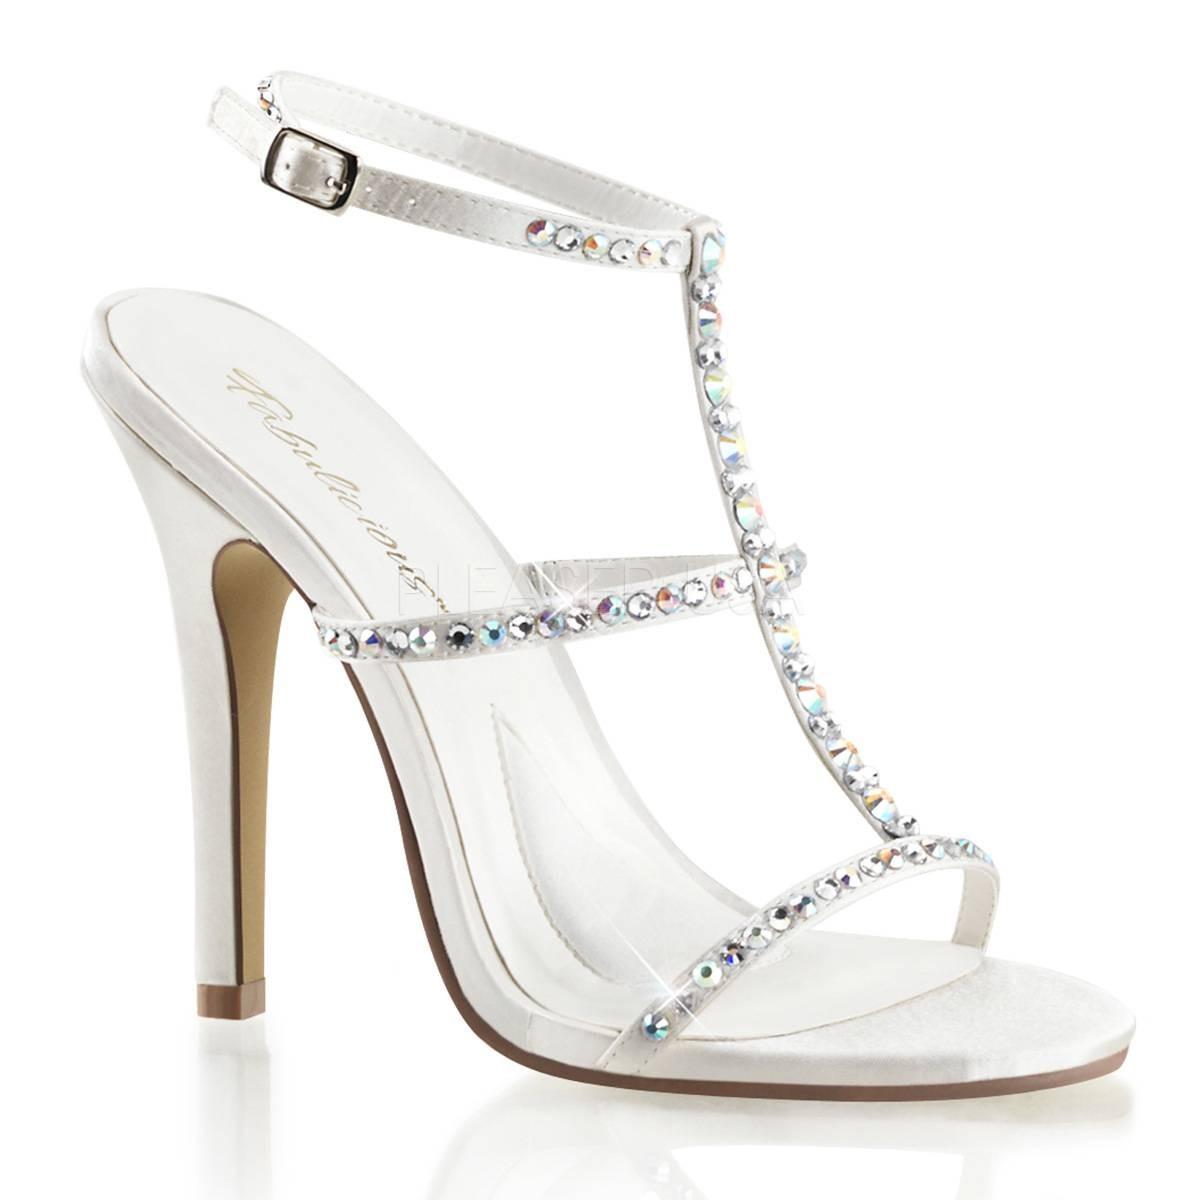 Sandalen - MELODY 18 ° Damen Sandalette ° Weiß Satin ° Fabulicious  - Onlineshop RedSixty